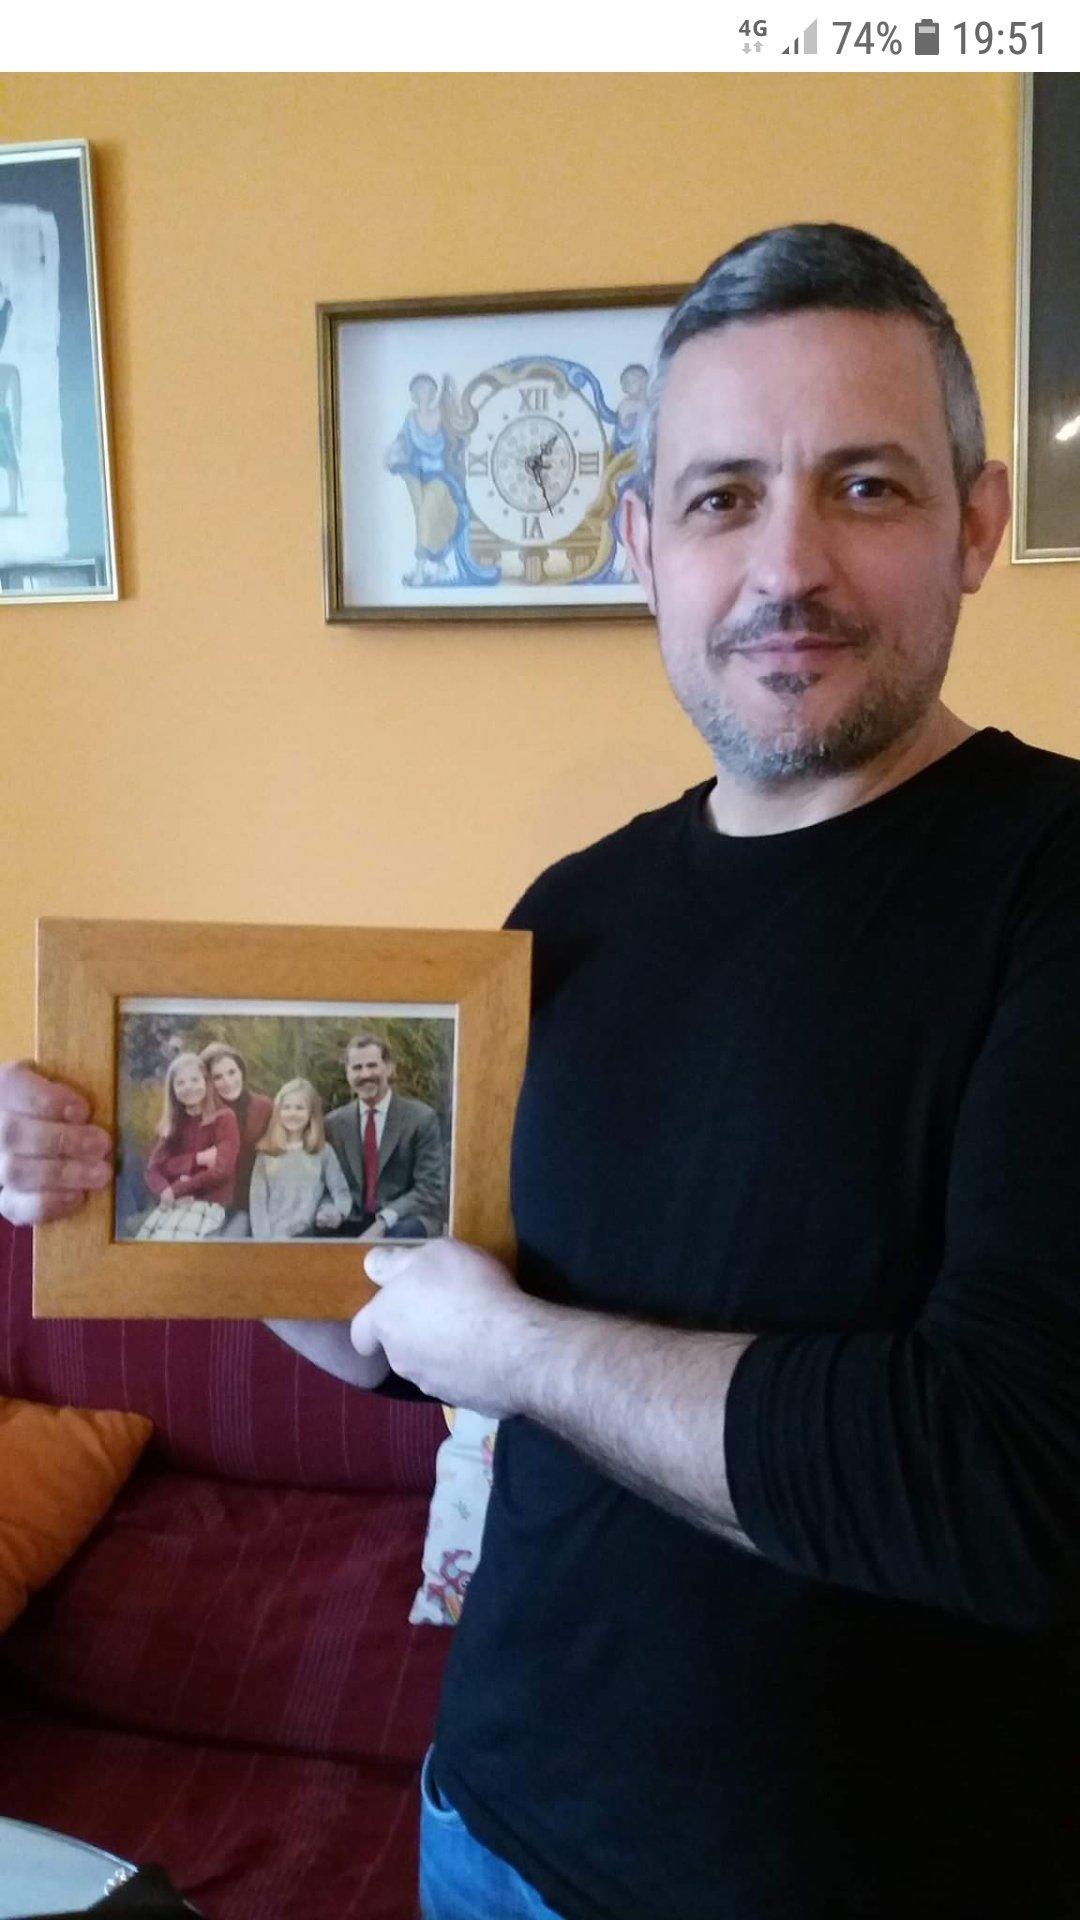 Raja Padilla ha apadrinado a una familia desestructurada